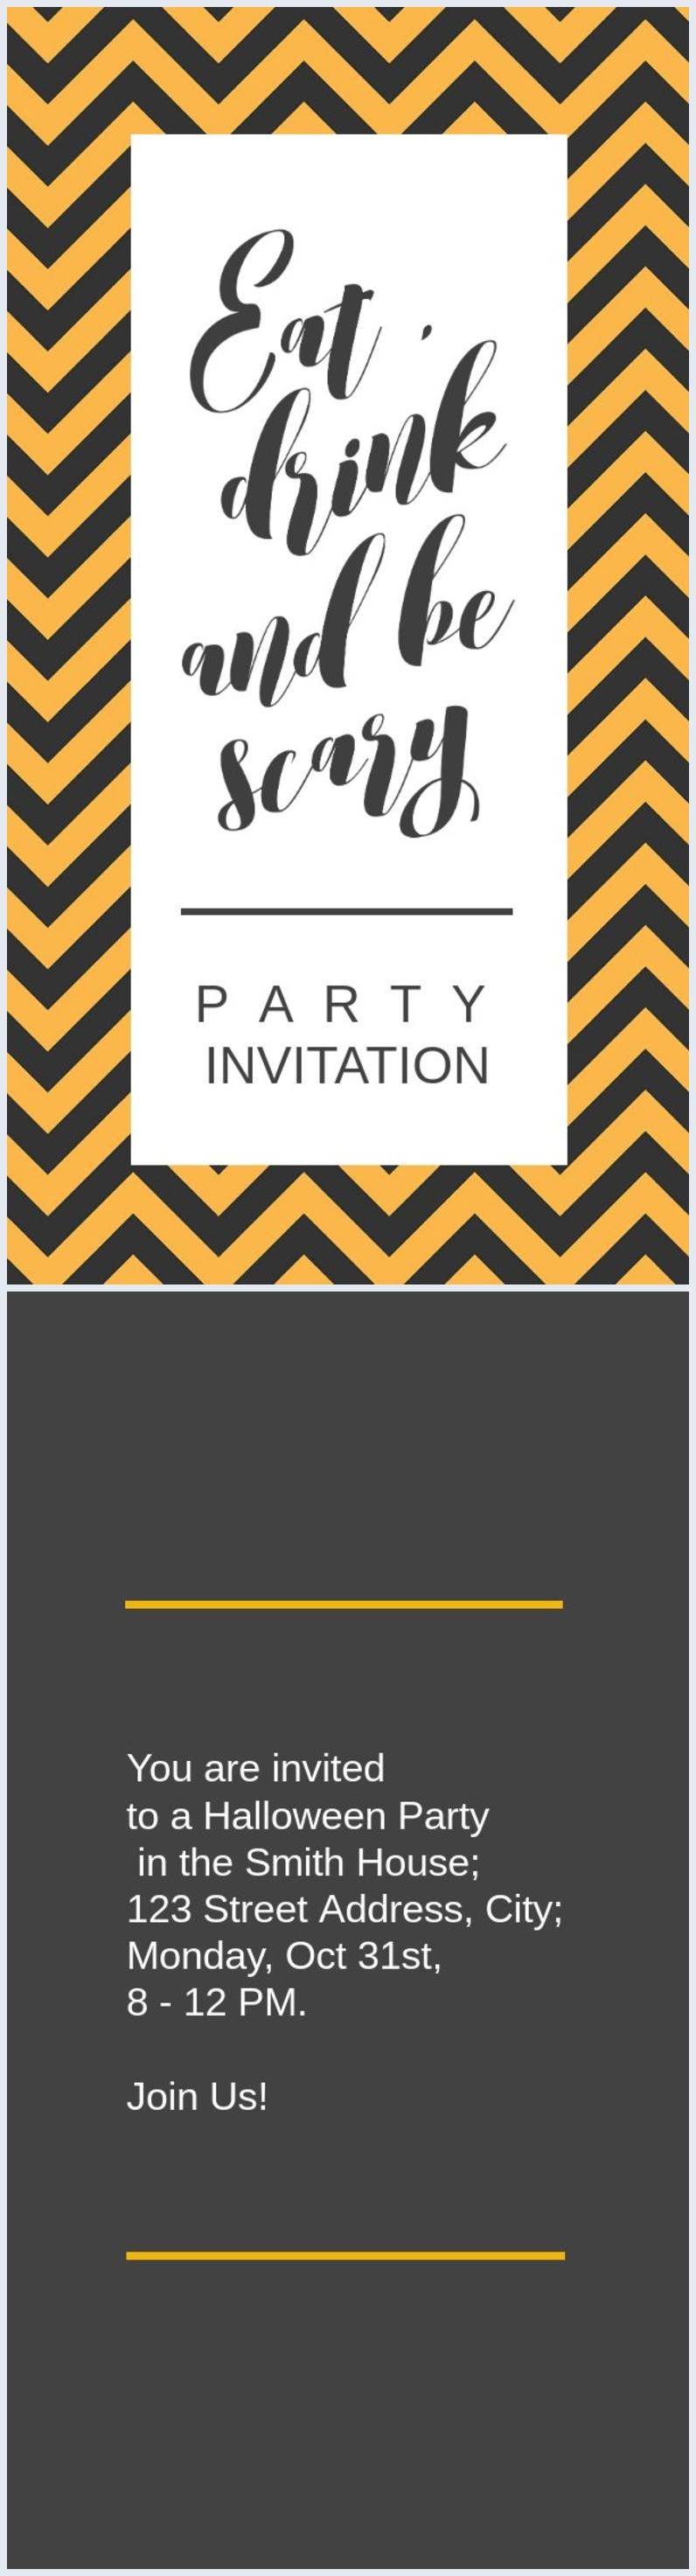 Halloween Party Invitation Example